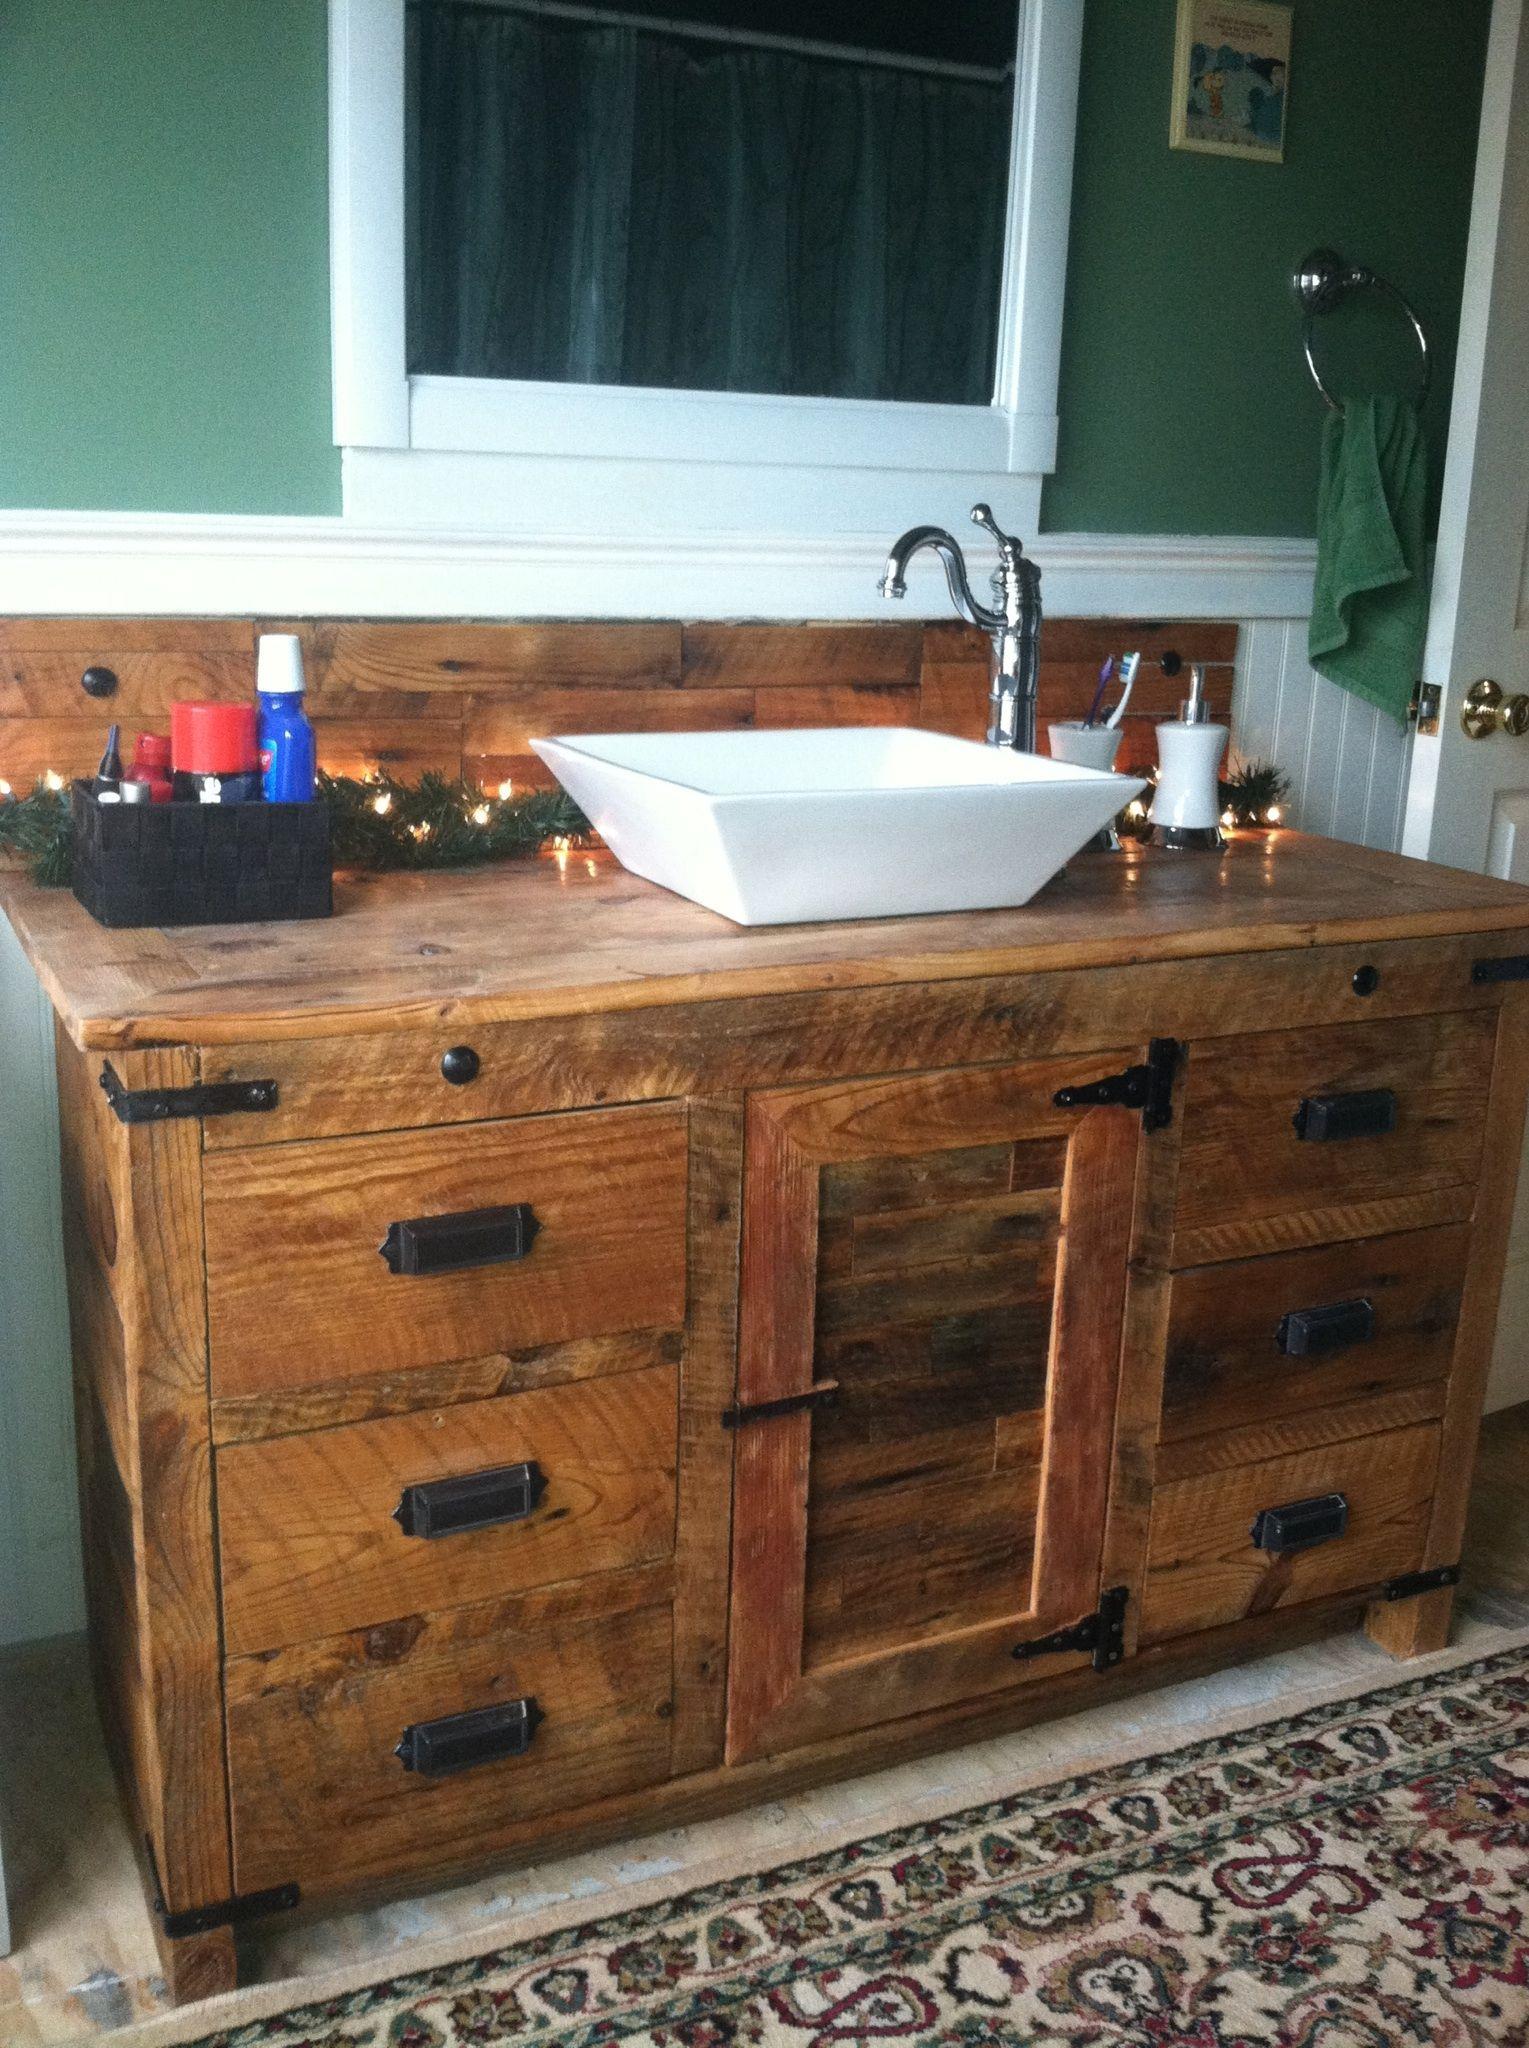 12 Clever Initiatives Of How To Improve Rustic Bathroom Vanity With Vessel Sink Bathroom Vanity Designs Small Bathroom Vanities Rustic Bathroom Vanities